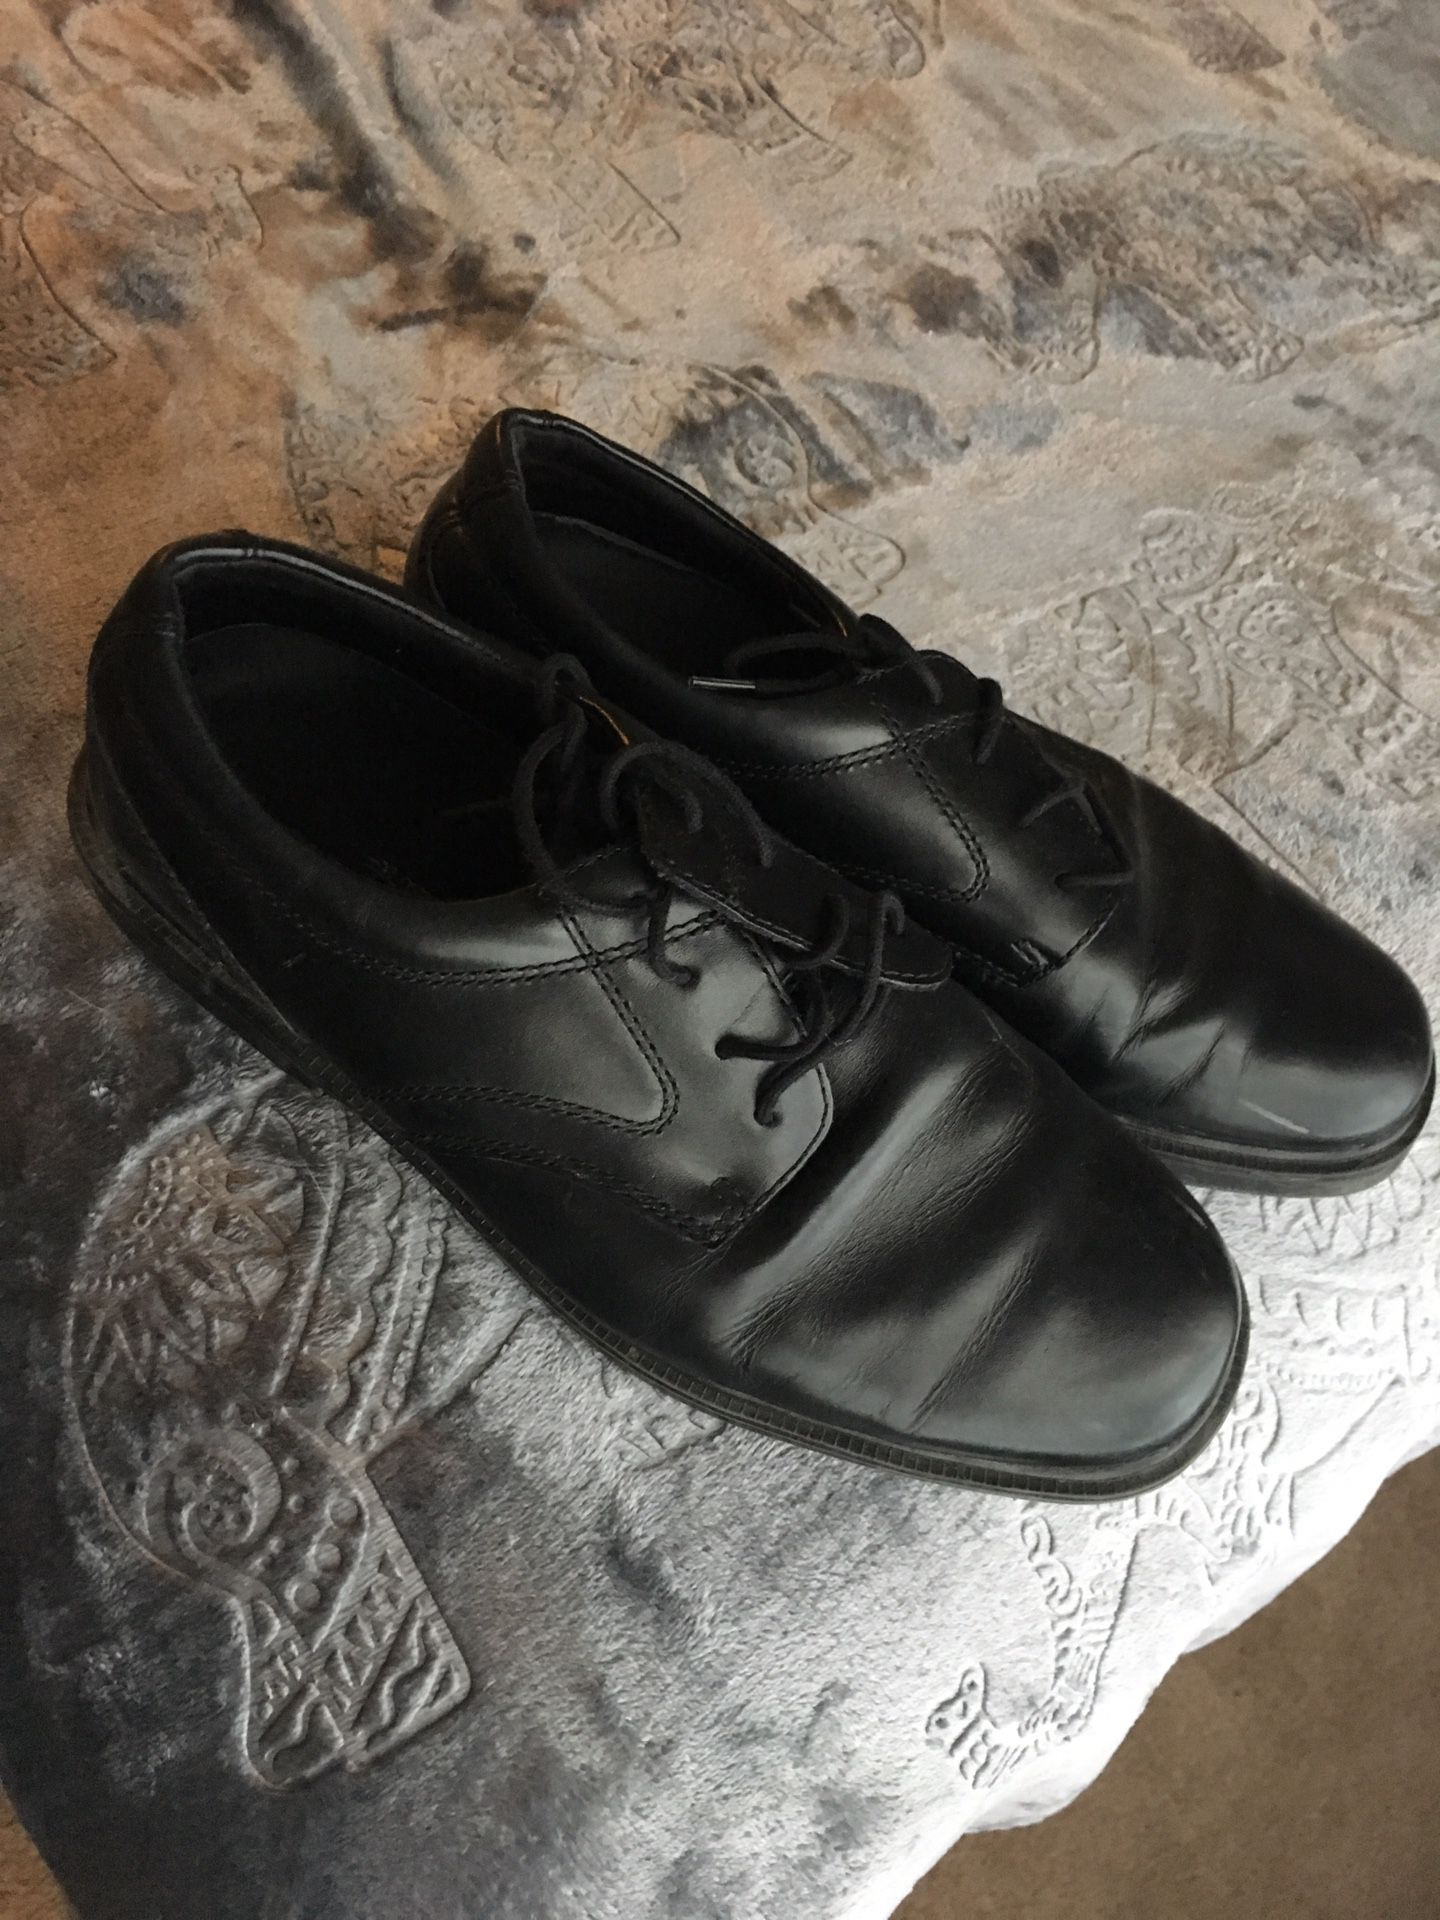 Nunn Bush slip resistant shoes